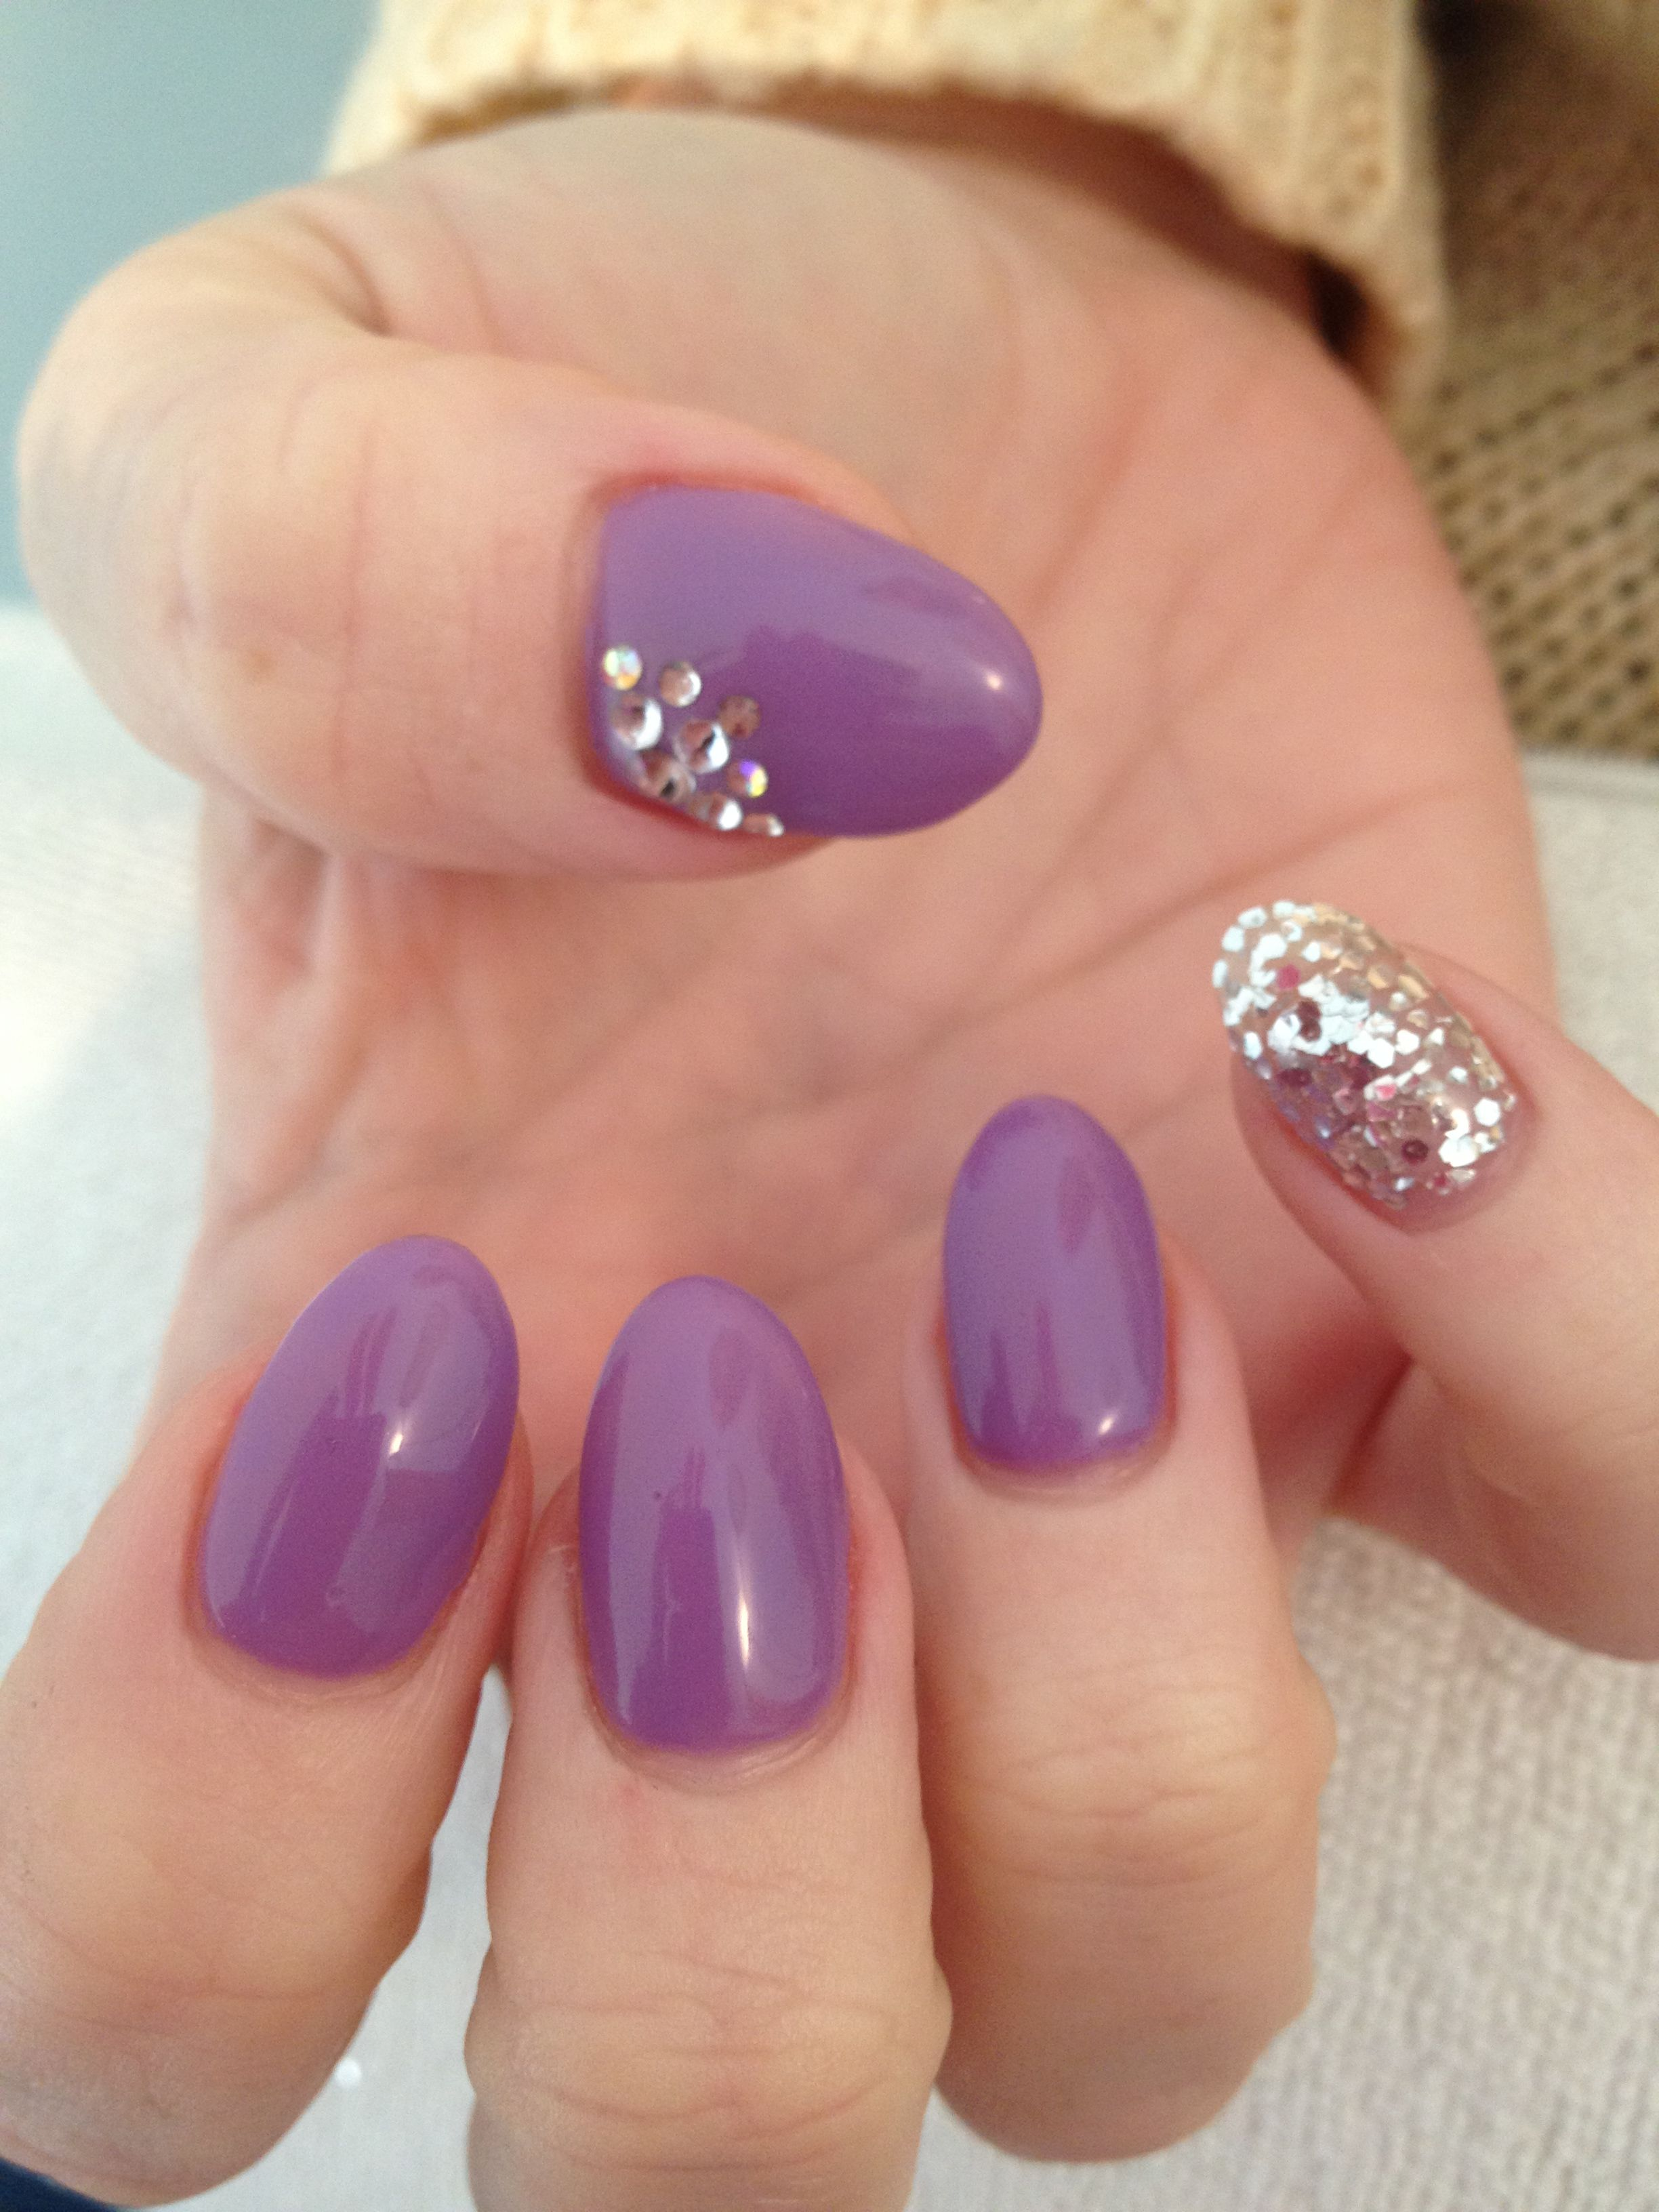 Gels purplelavender silver glitter diamonds oval shape nail